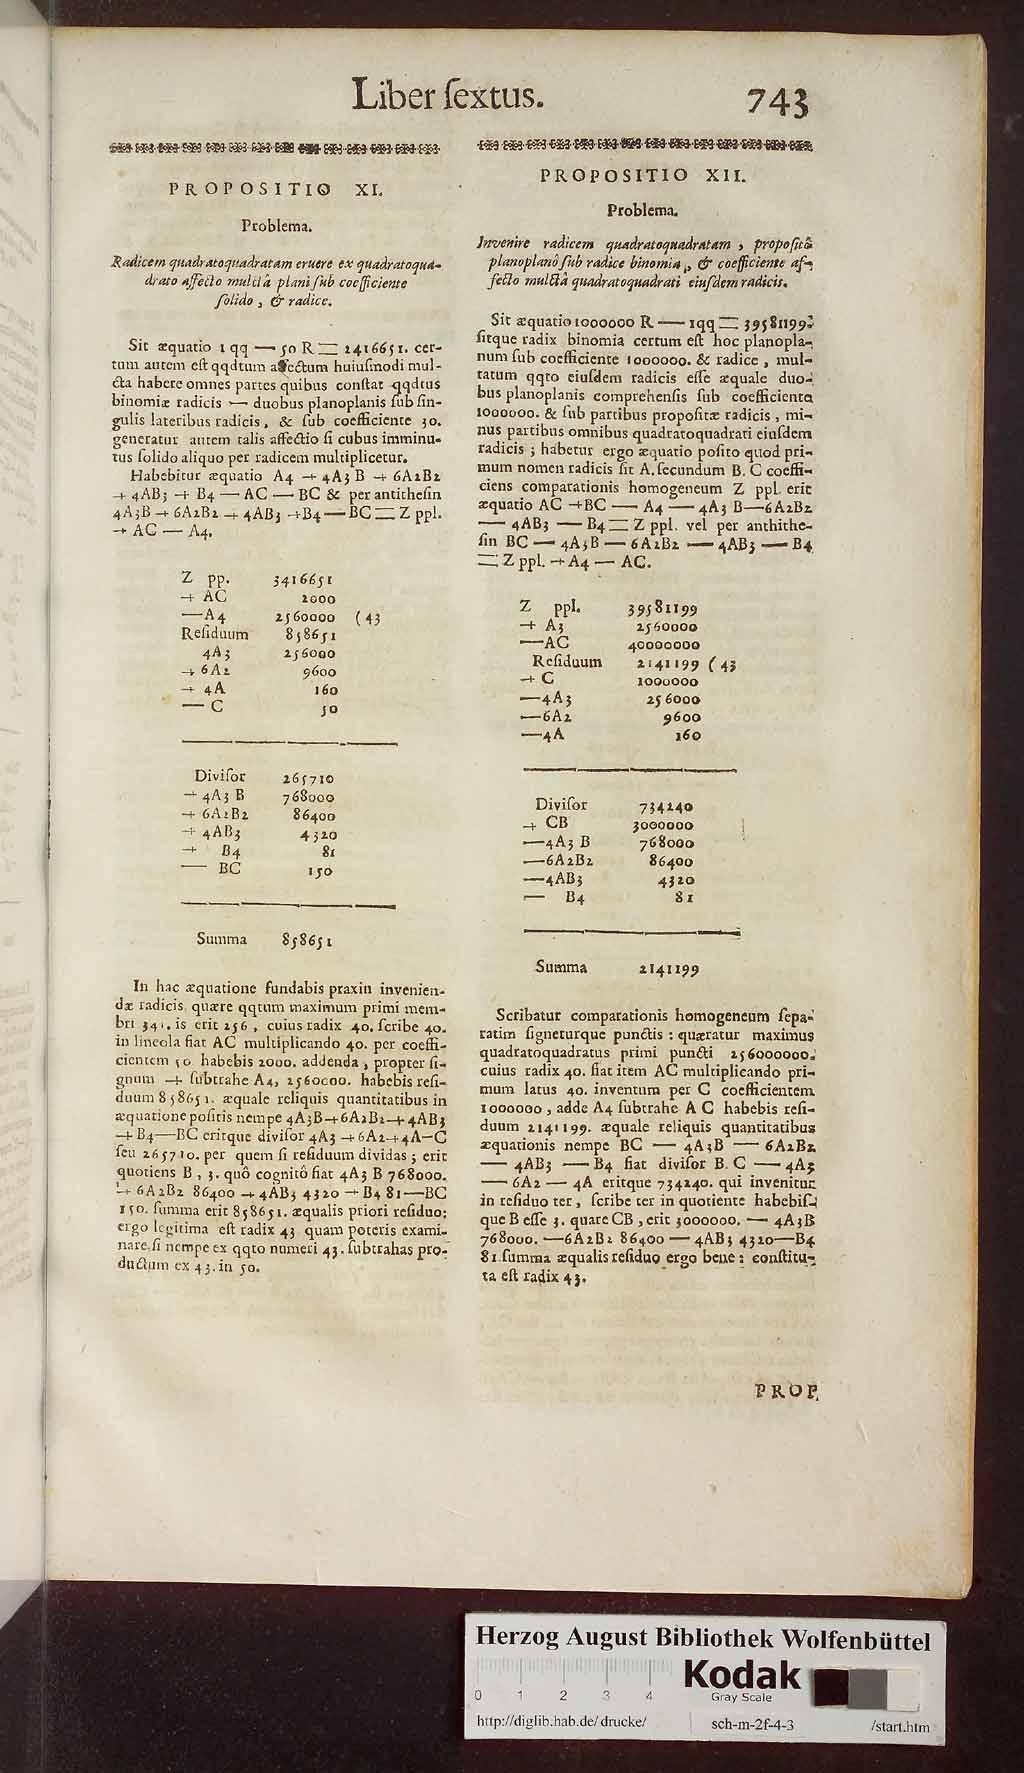 http://diglib.hab.de/drucke/sch-m-2f-4-3/00783.jpg